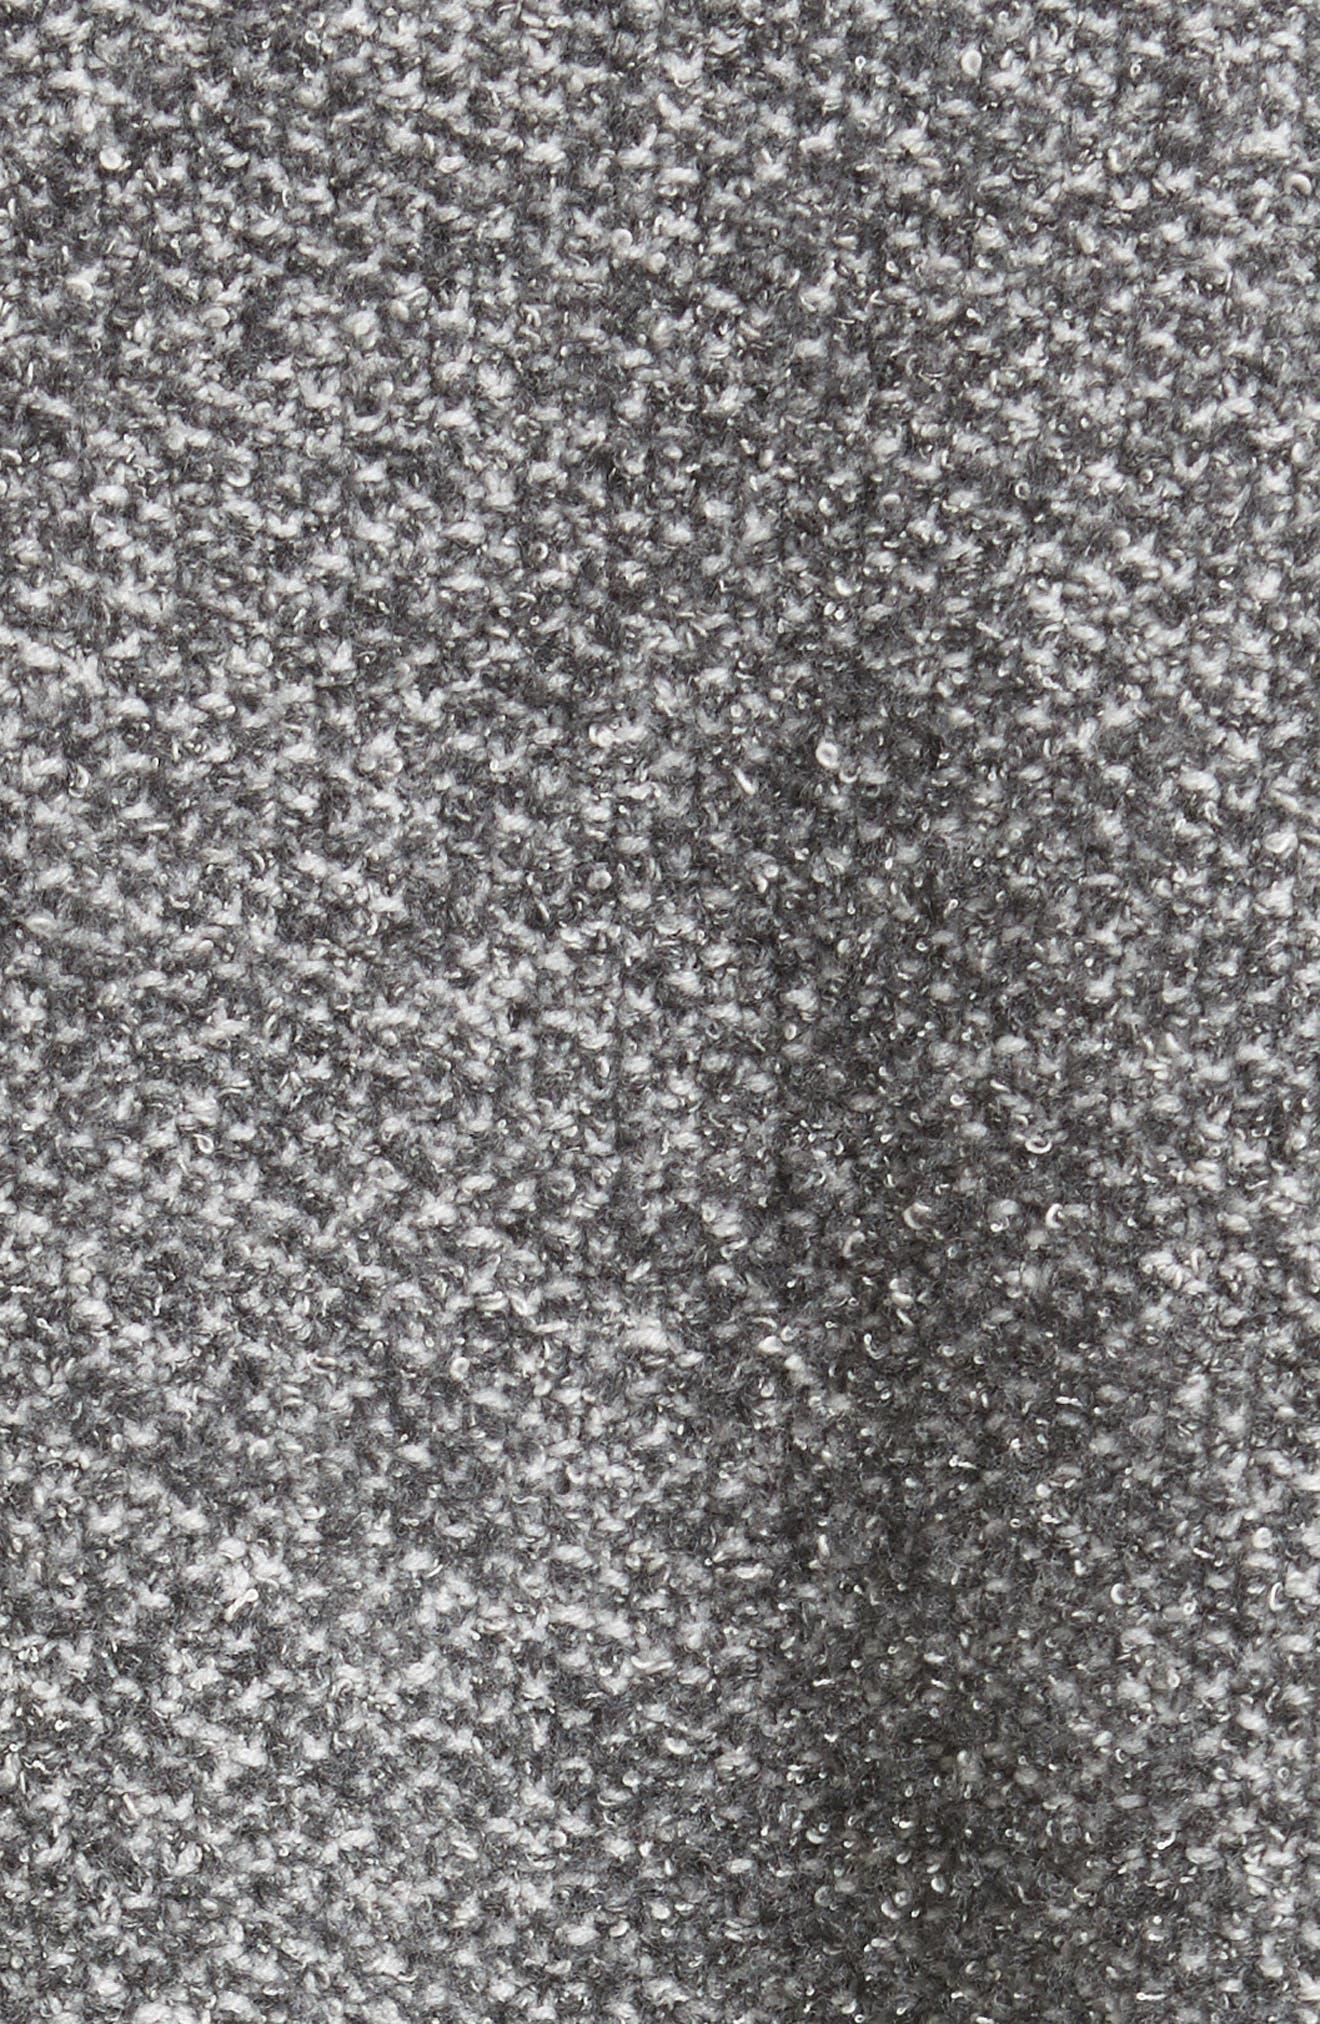 Pebble Tweed Knit Poncho with Genuine Fox Fur Collar,                             Alternate thumbnail 3, color,                             Grey Multi